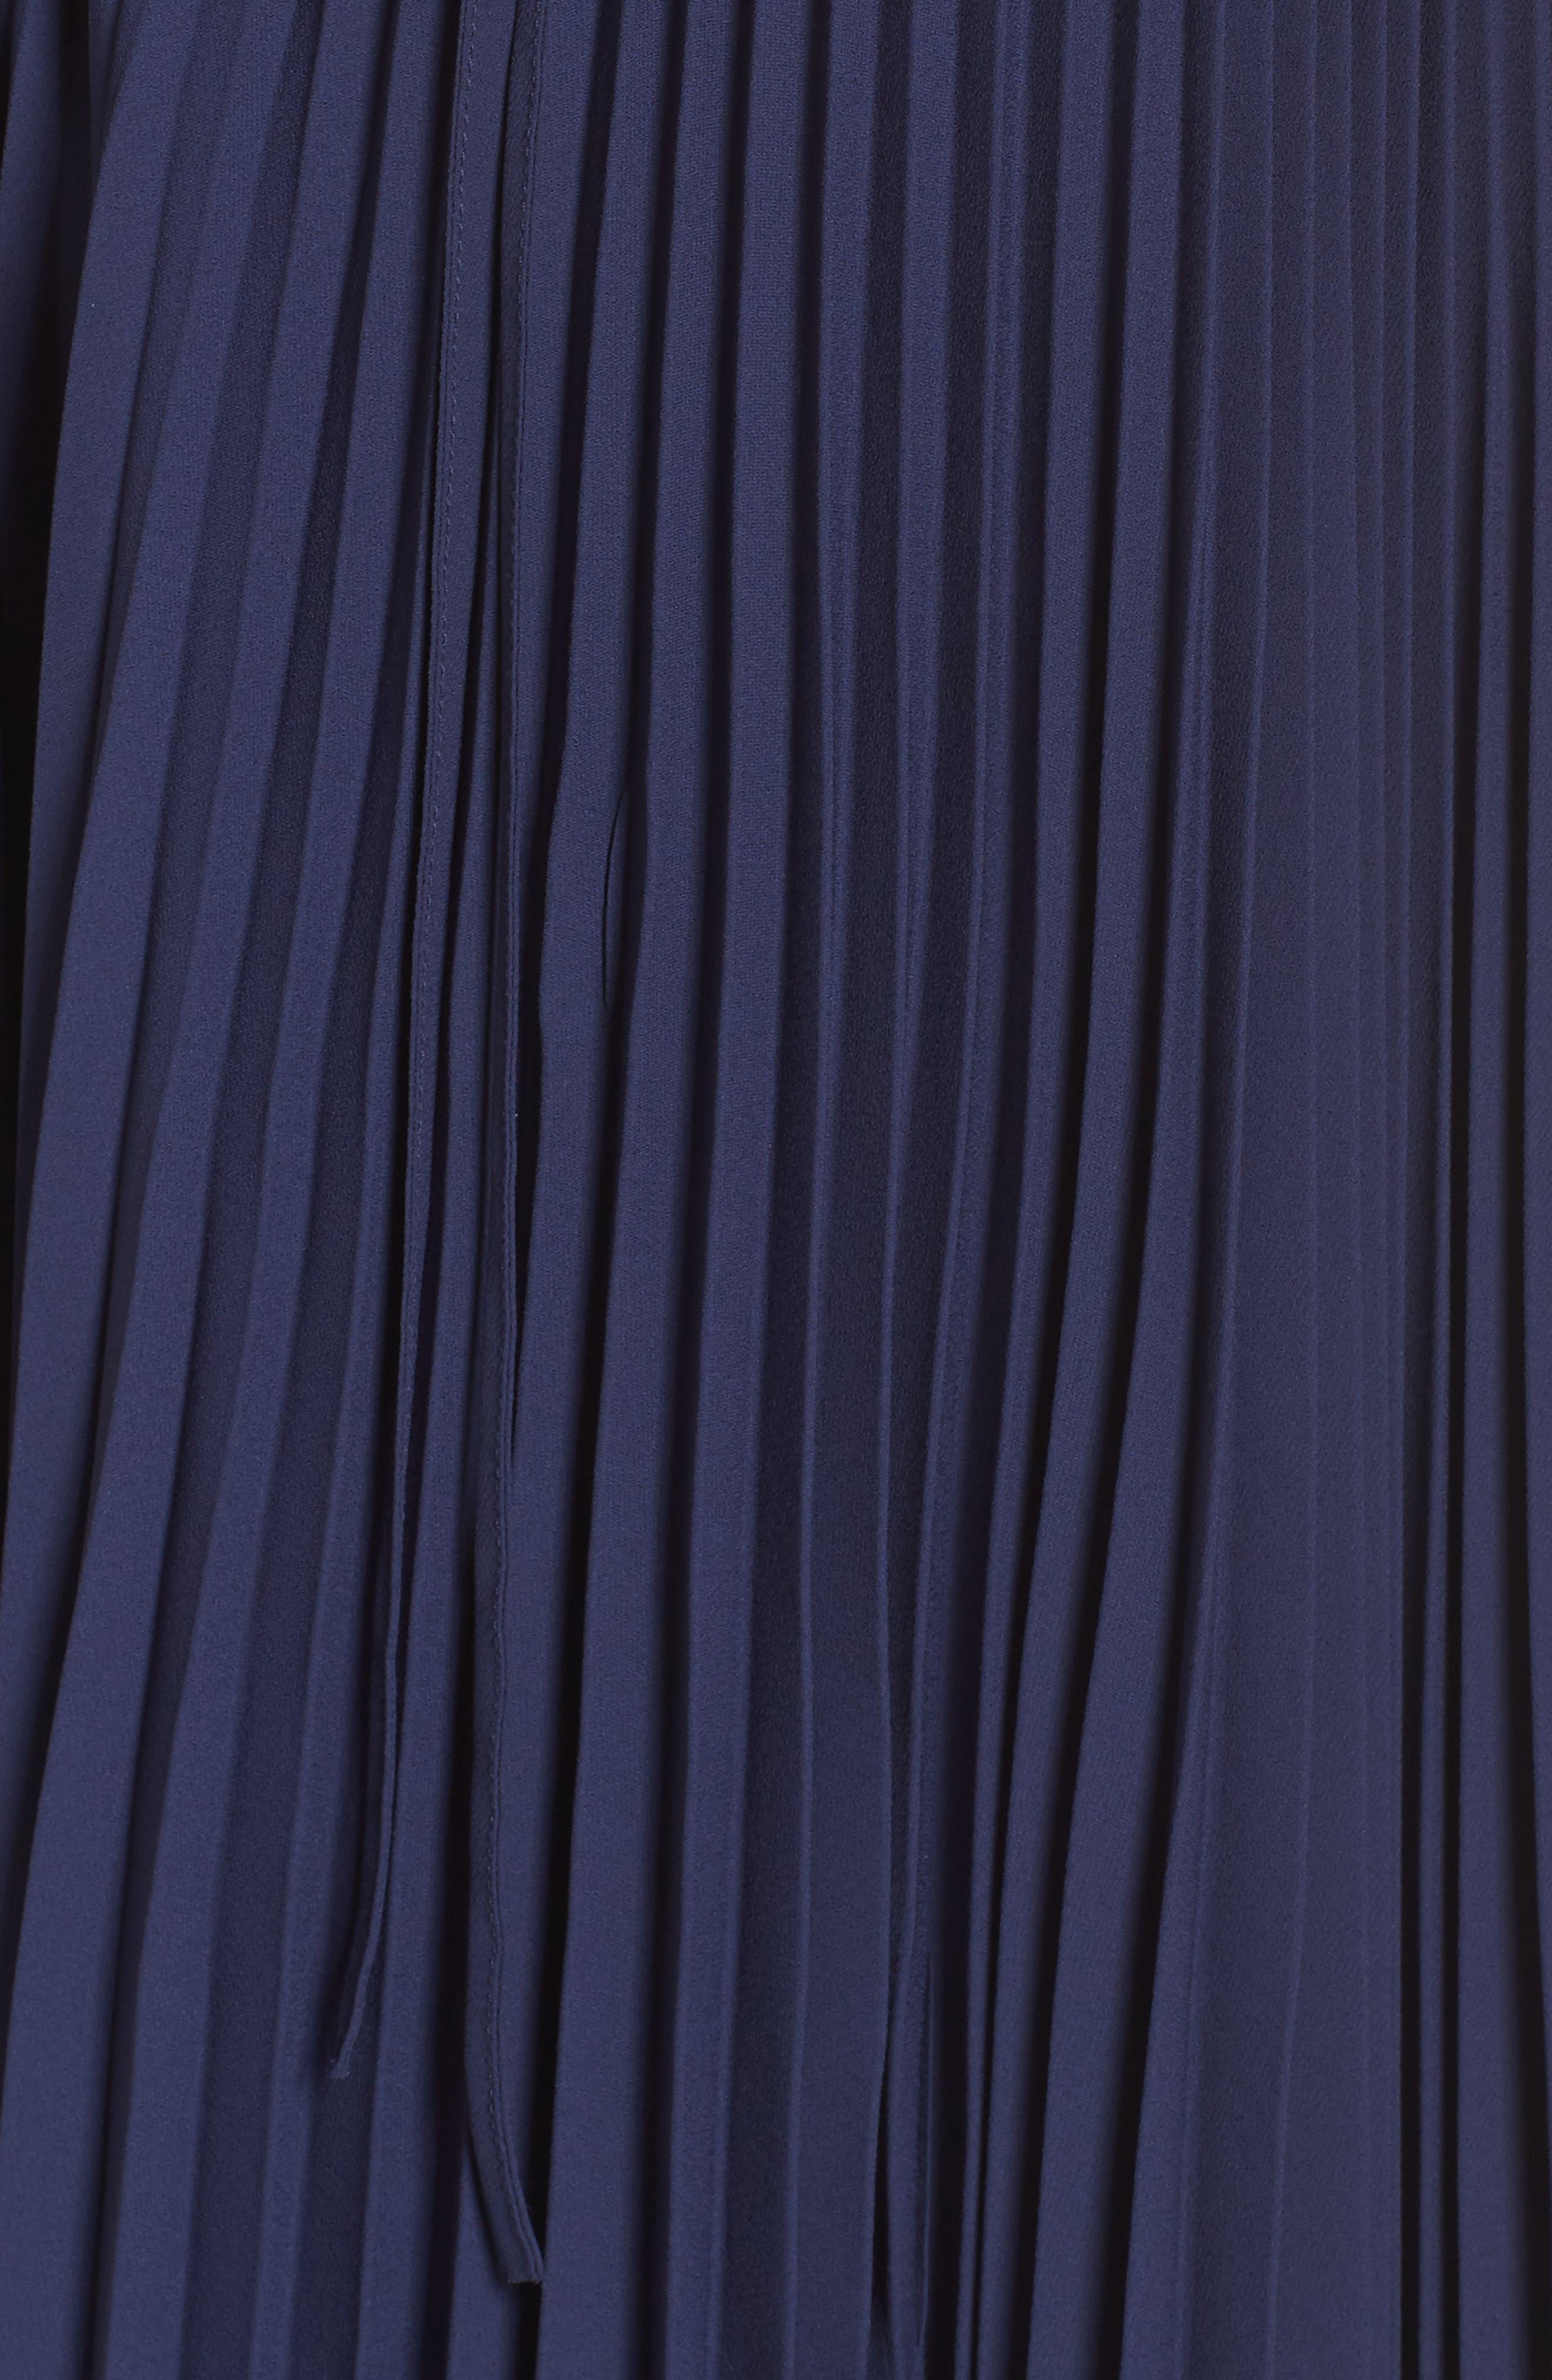 Elise Off the Shoulder Pleated Georgette Dress,                             Alternate thumbnail 6, color,                             462